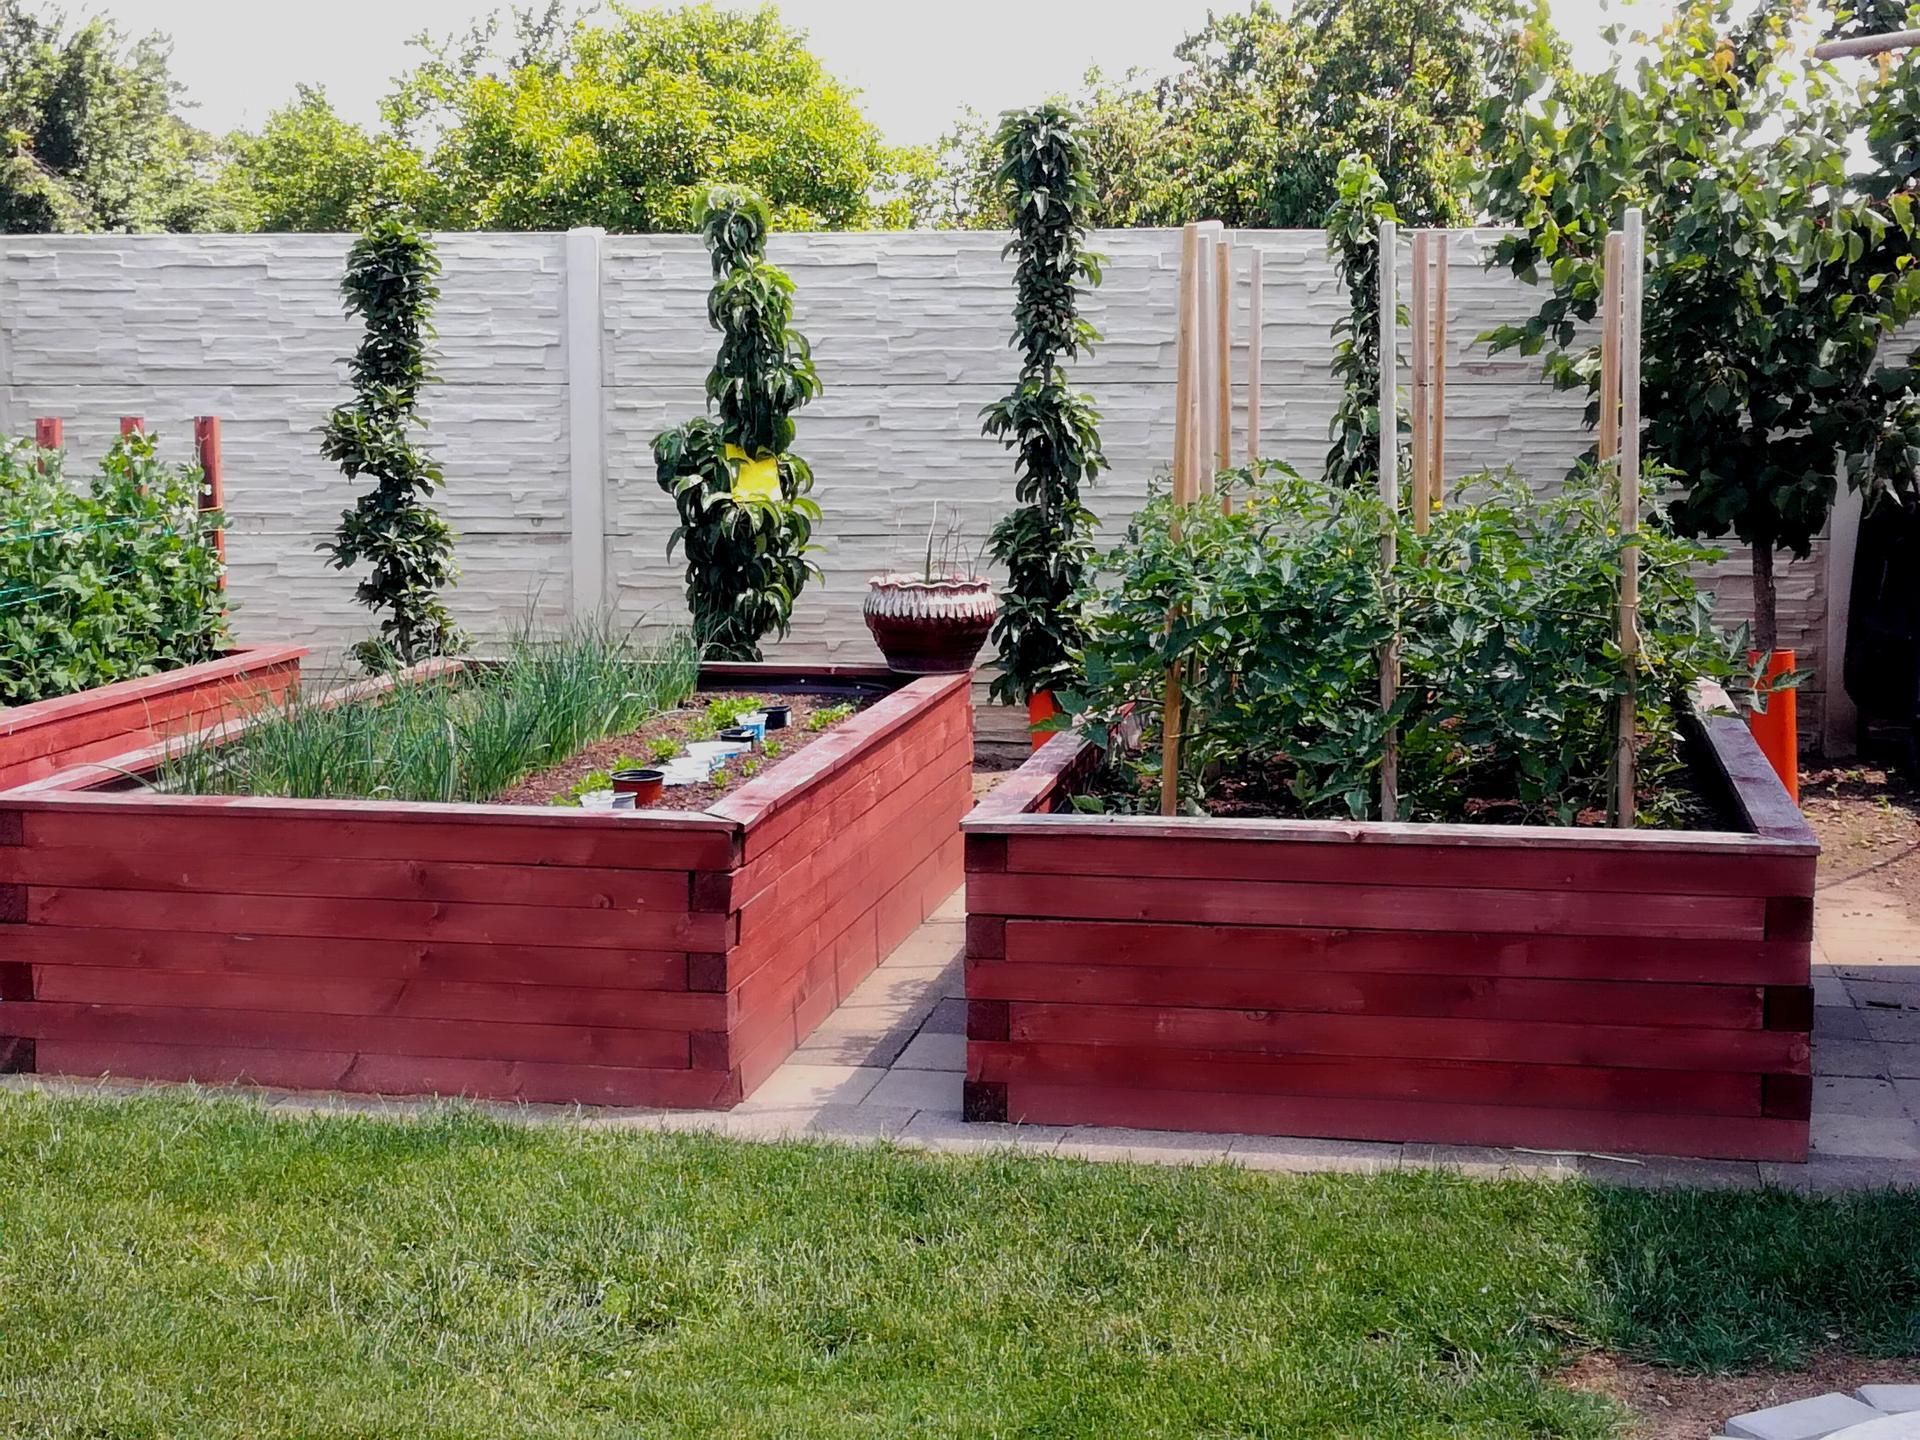 Zahrada 2021 🌲 - Obrázek č. 123